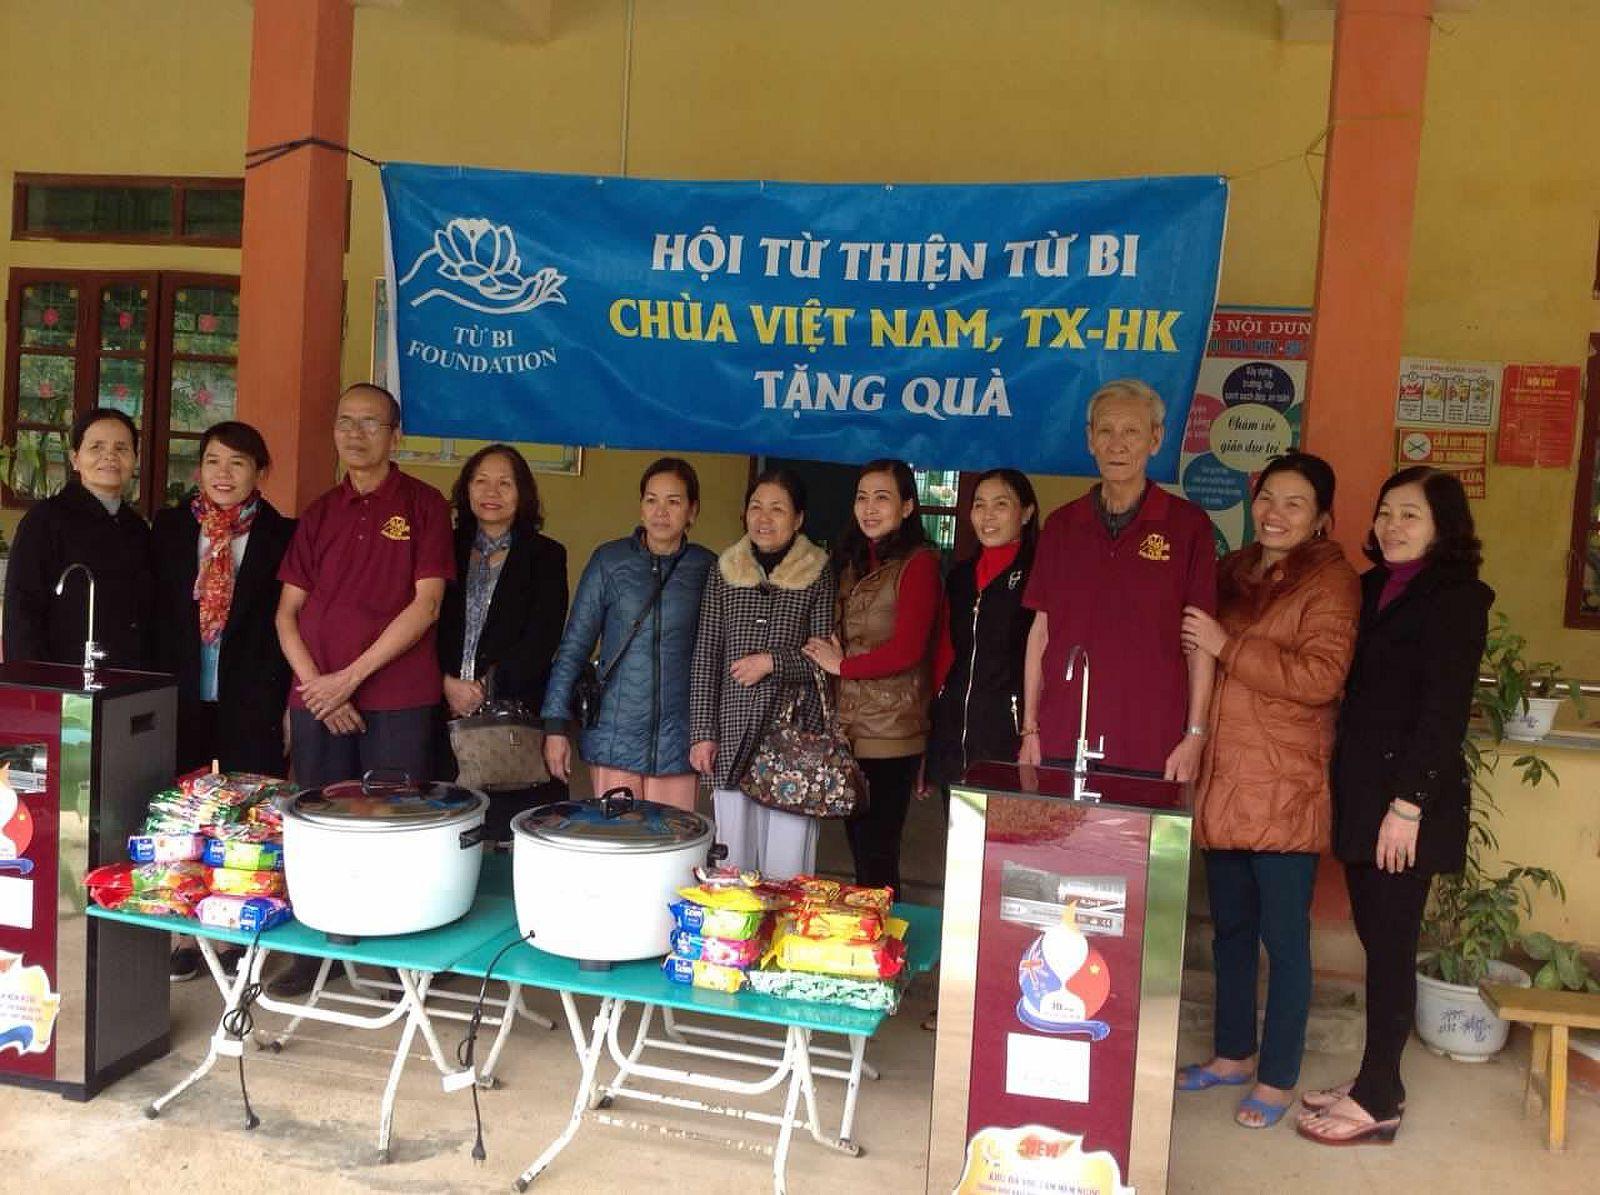 Quang Binh 2 (36)